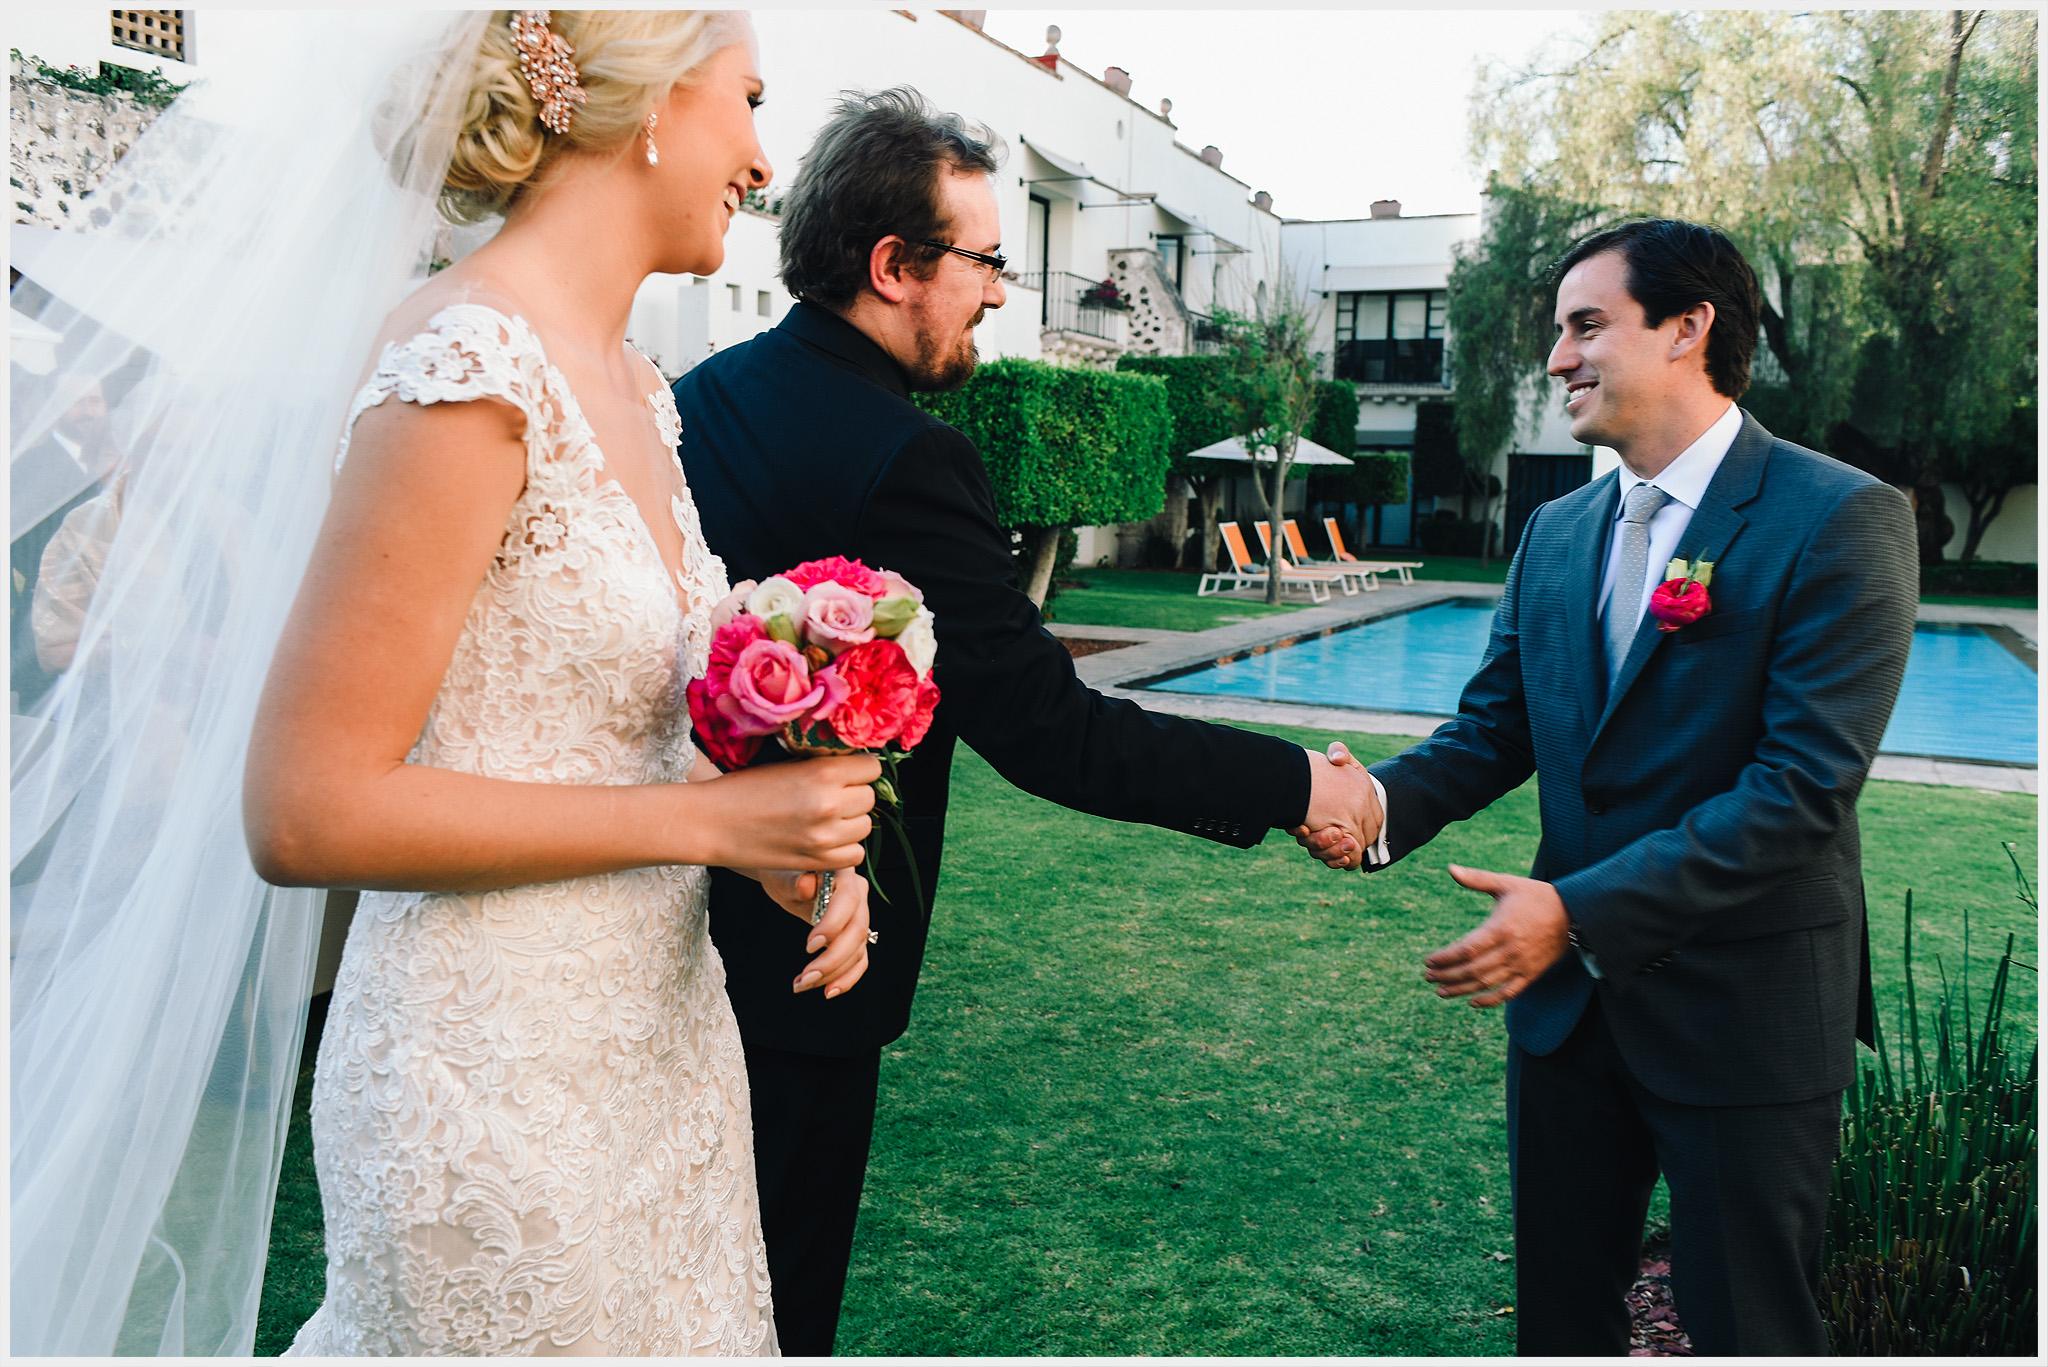 martin muriel mexico wedding_35.jpg